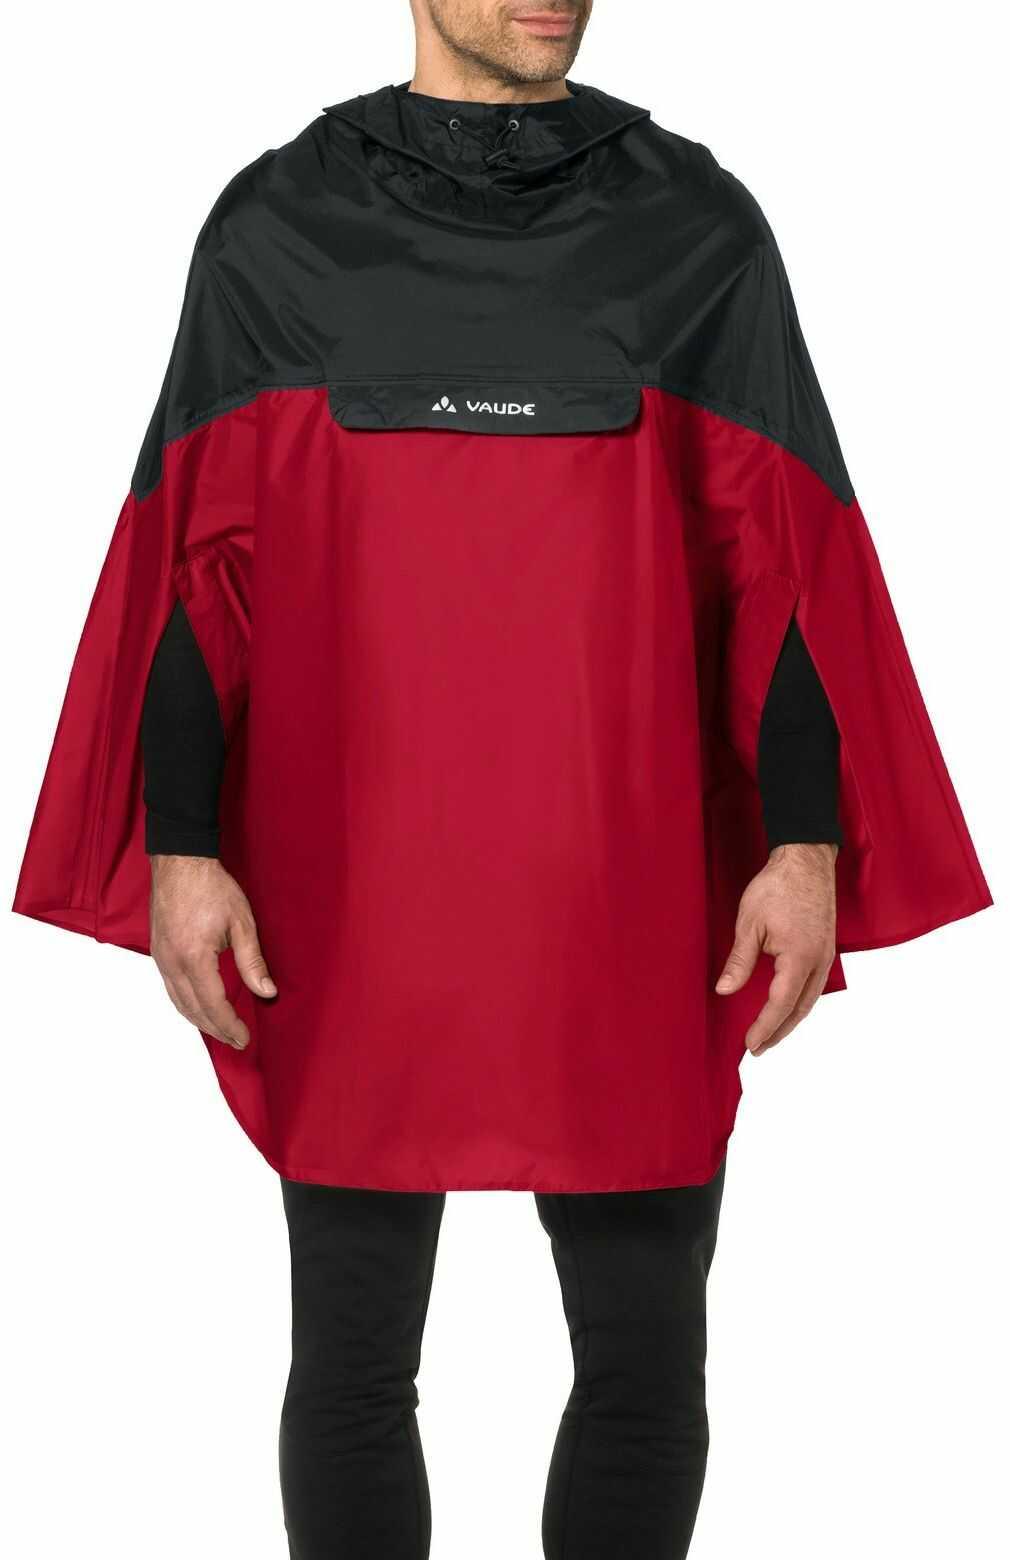 Vaude Poncho męskie Covero Poncho II, indian red, M, 068096140300